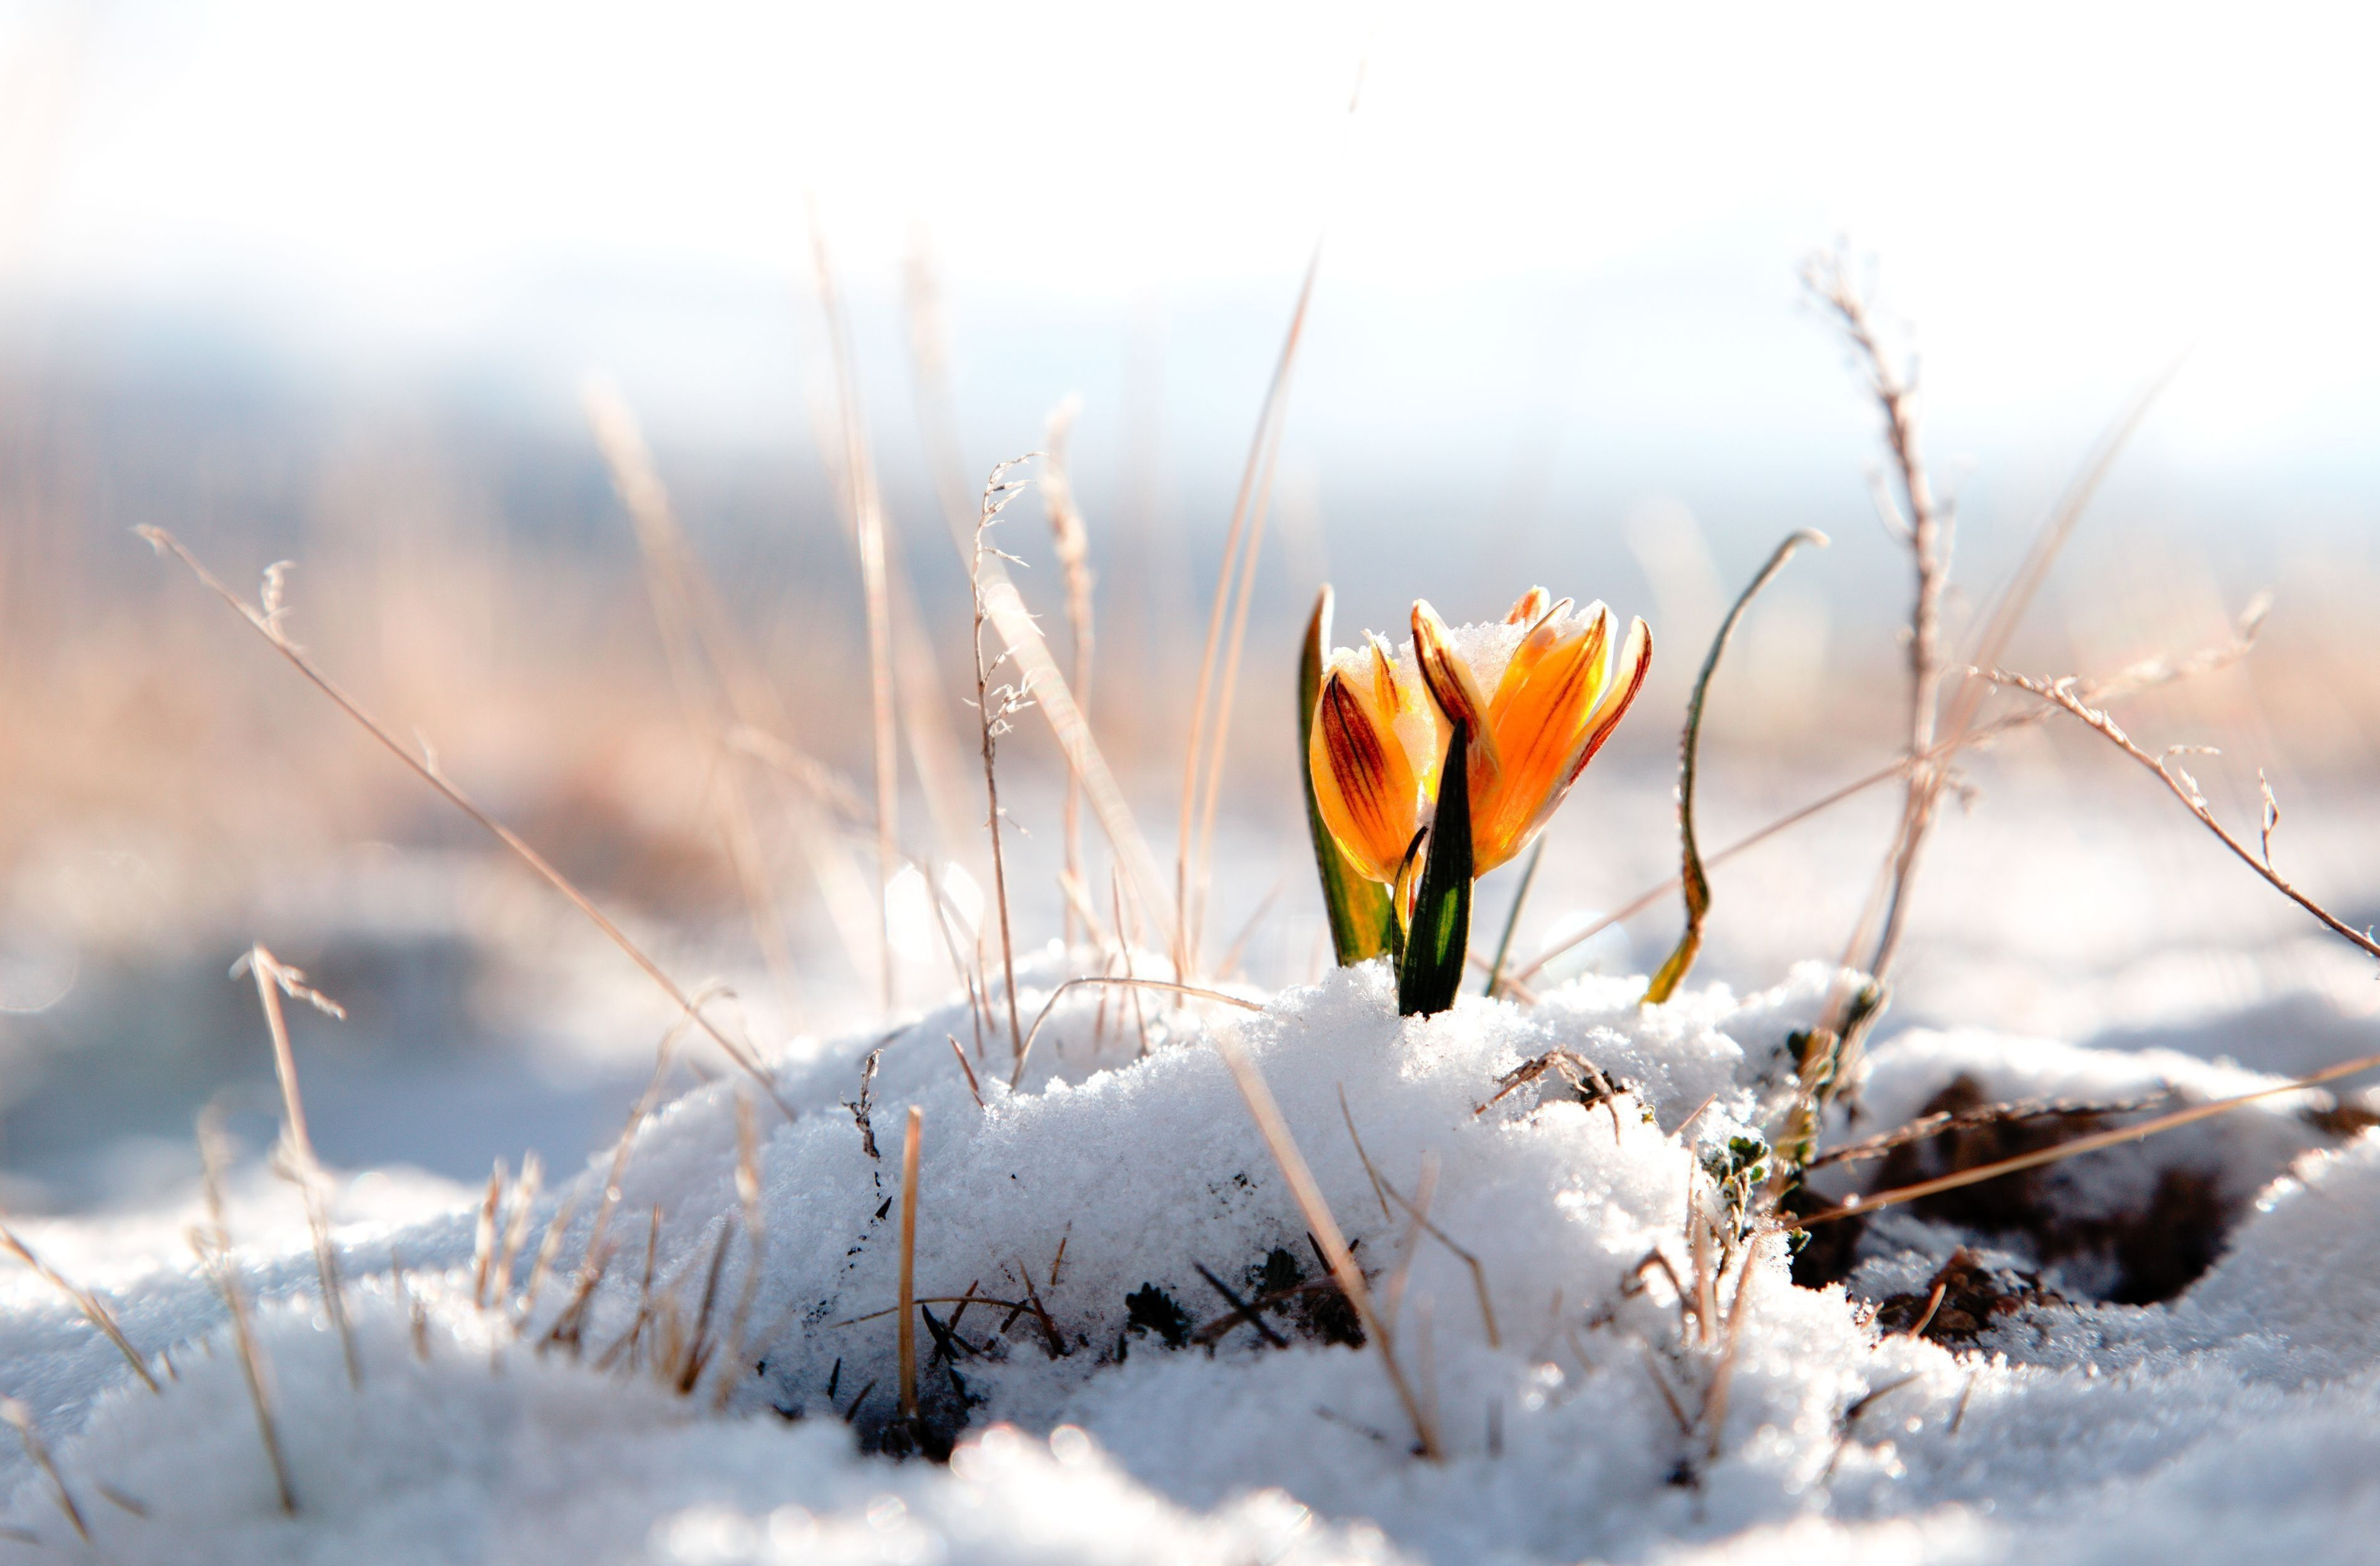 spring stirs under silent snow. ~terri guillemets | flowers